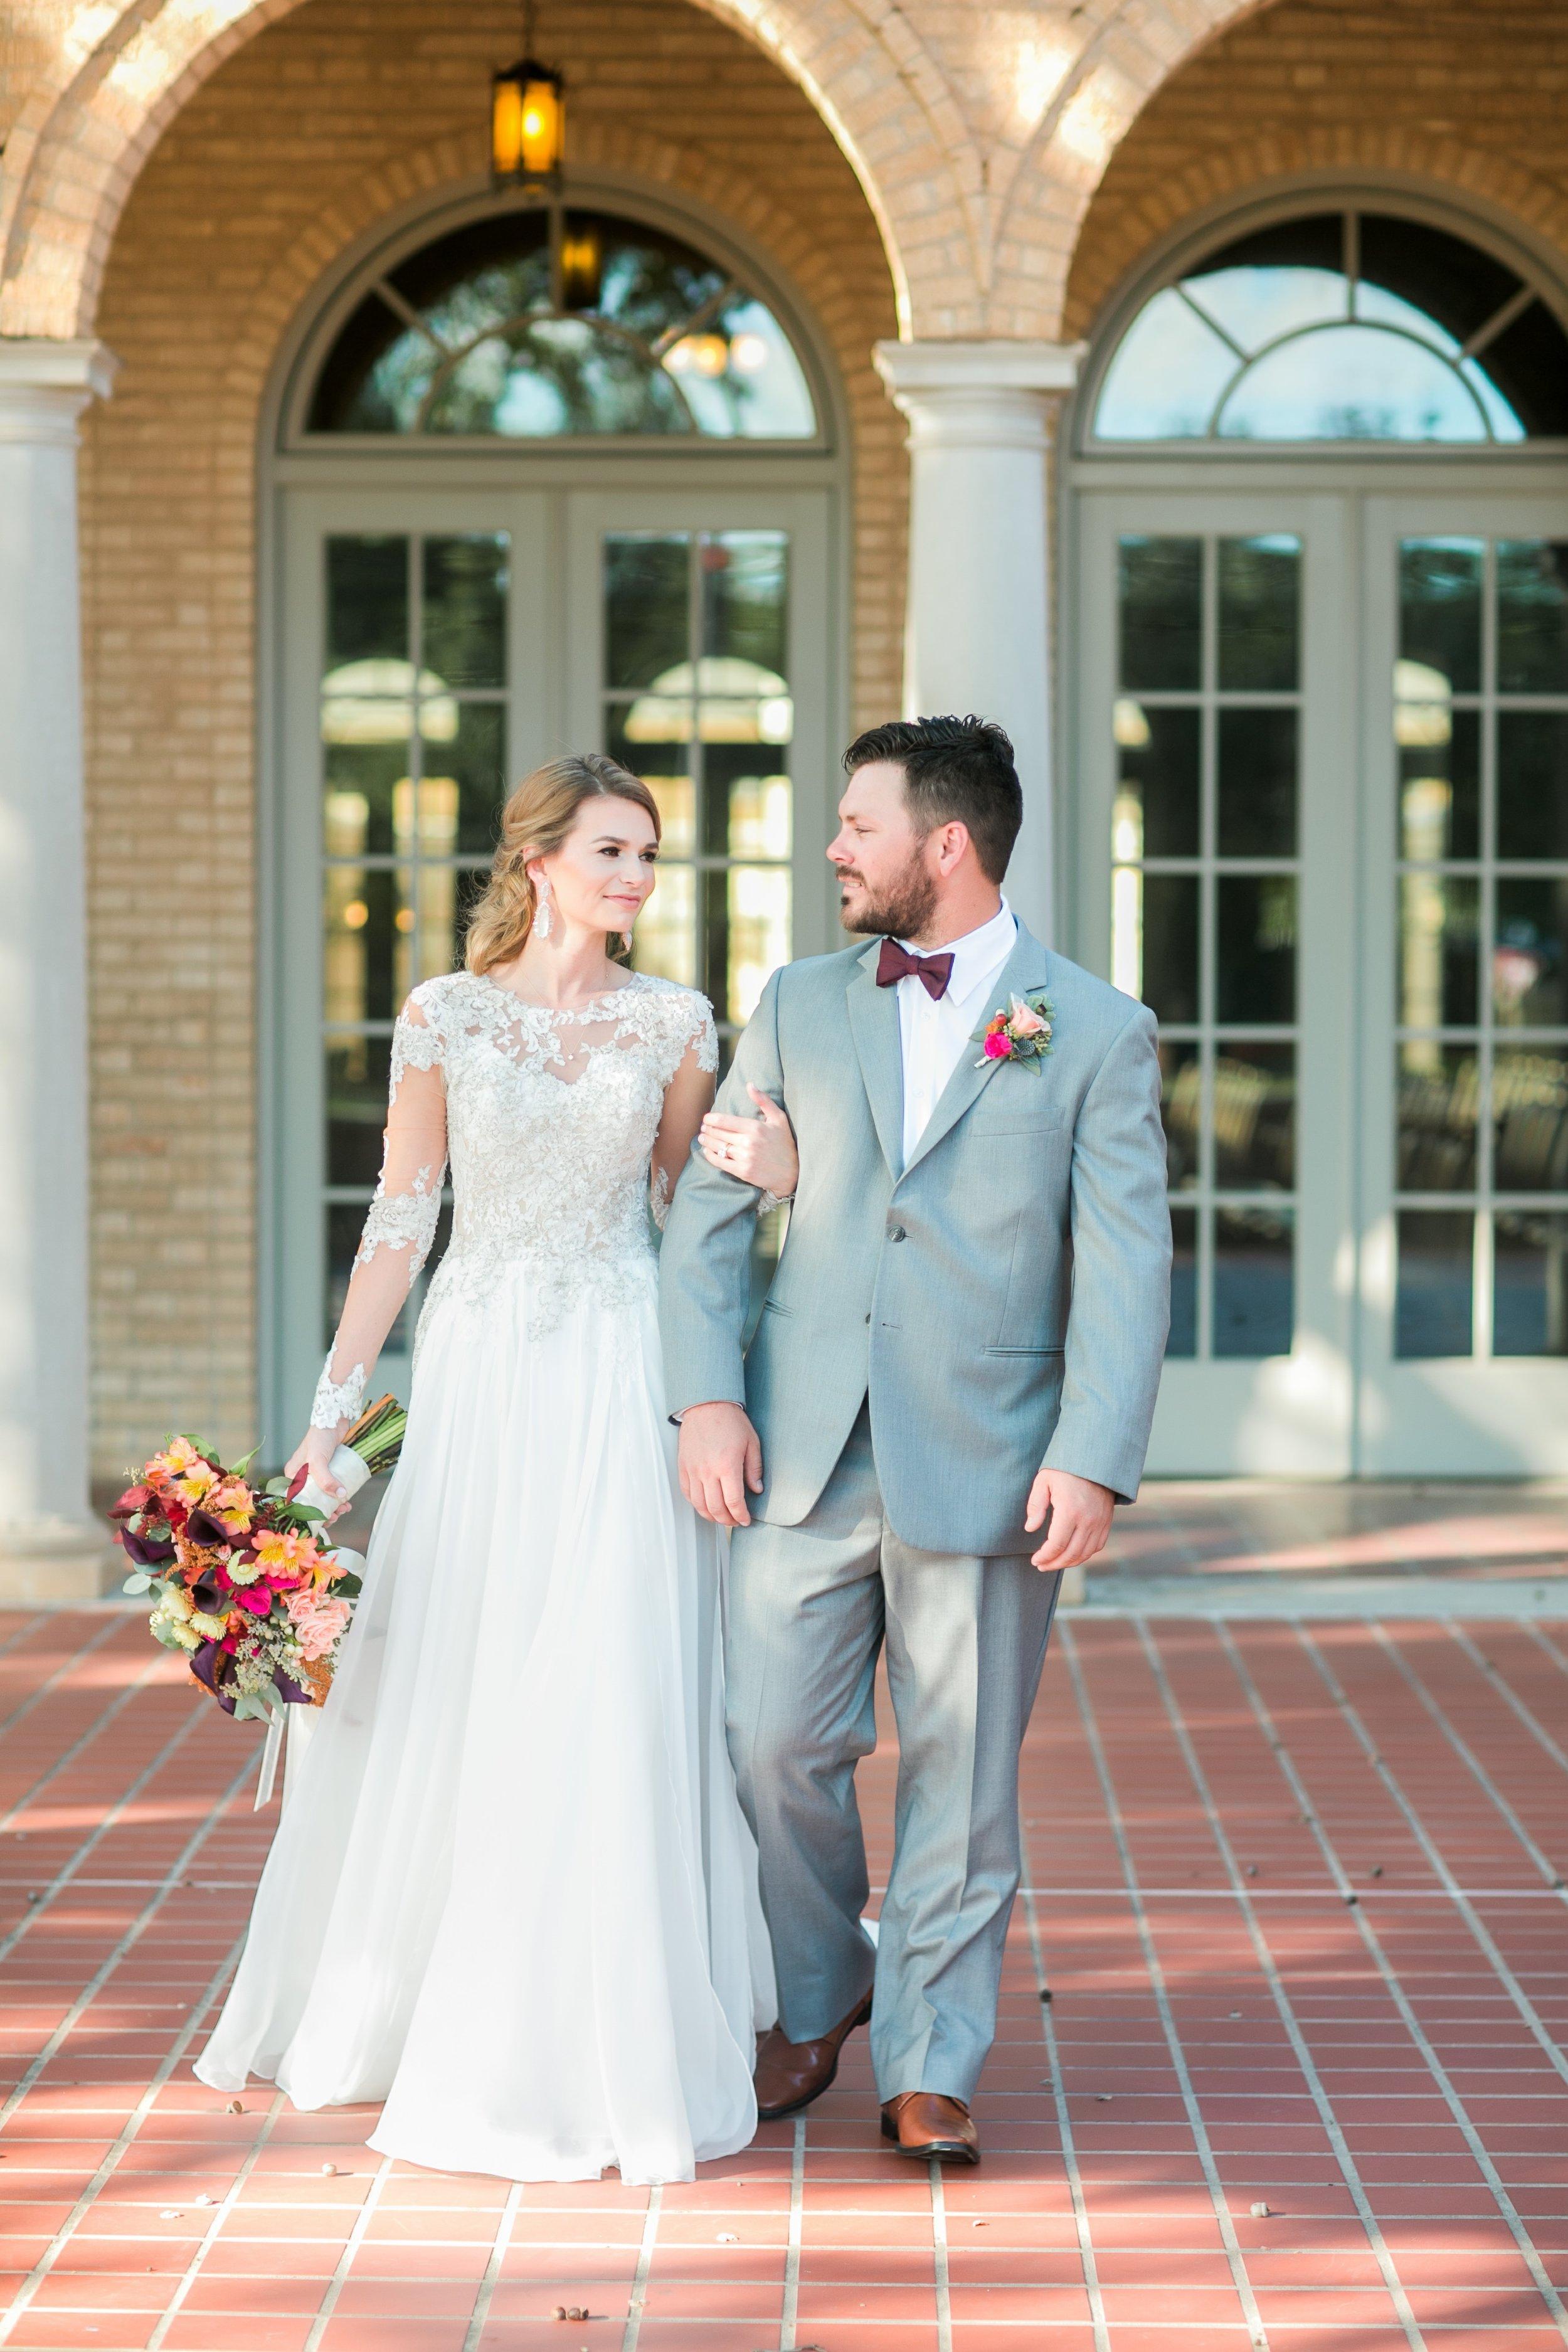 Roberson-Wedding-The-Forum-Lauren-Pinson-Wedding-Photography-Wichita-Falls-Texas-034.jpg